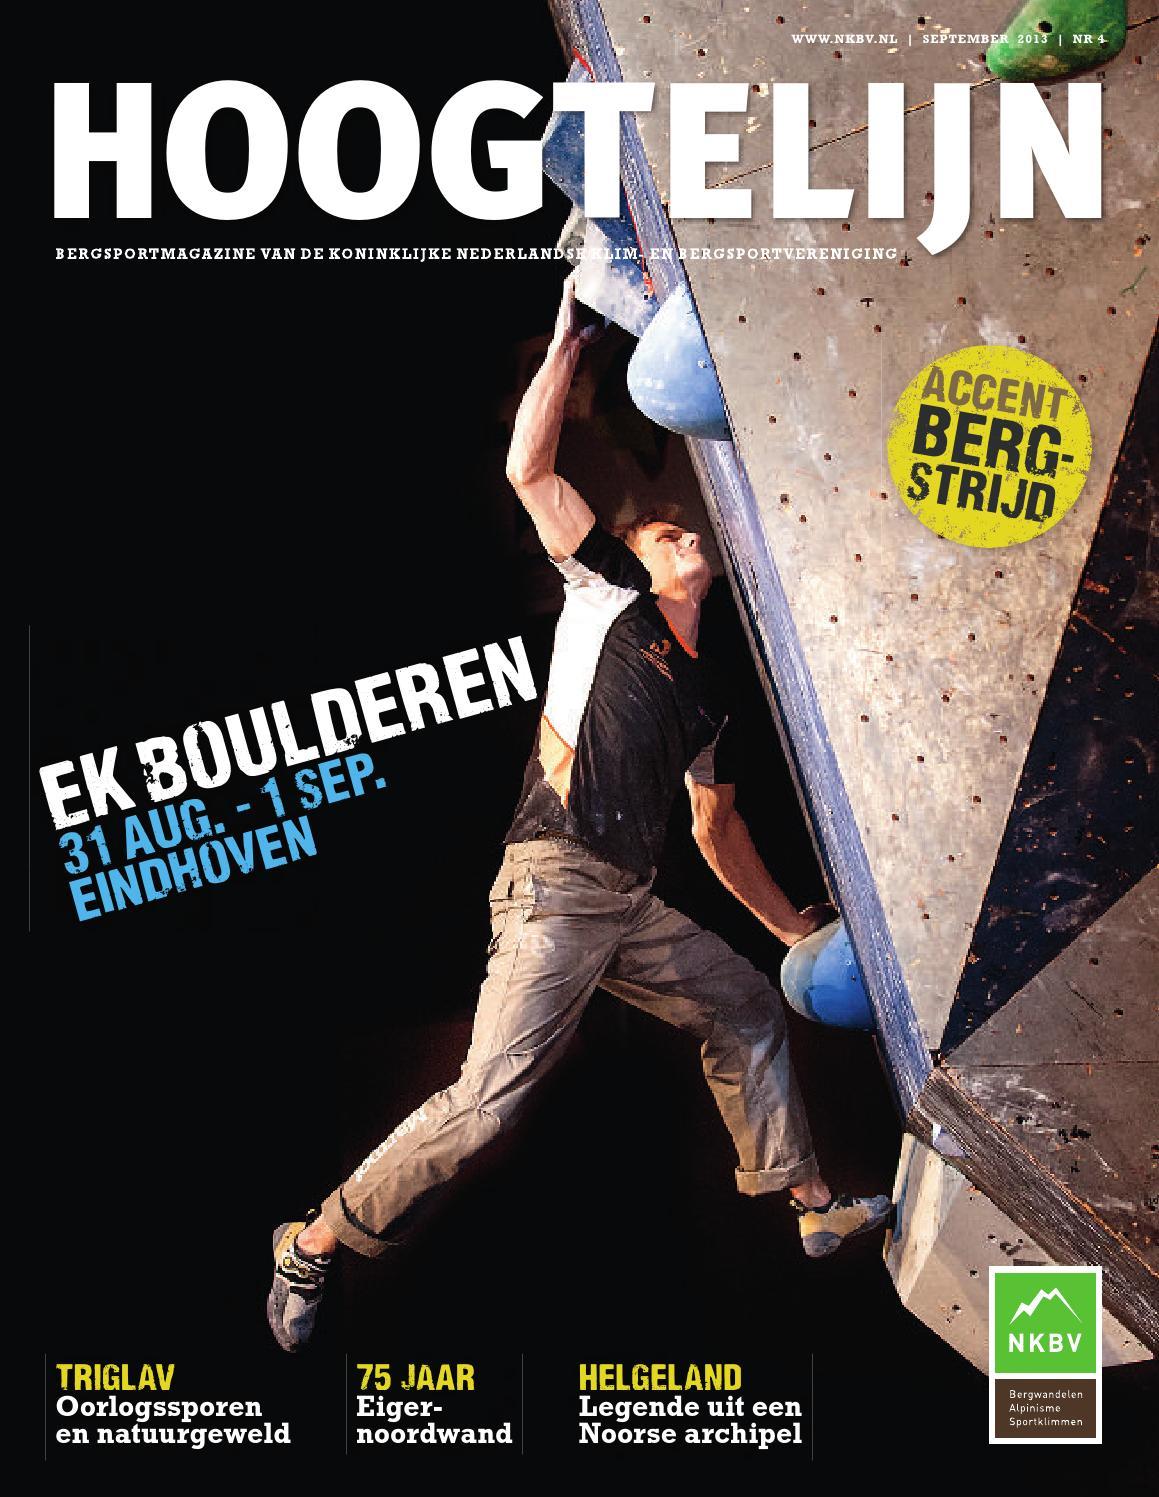 Hoogtelijn nummer 1 januari 2011 by Koninklijke NKBV - issuu